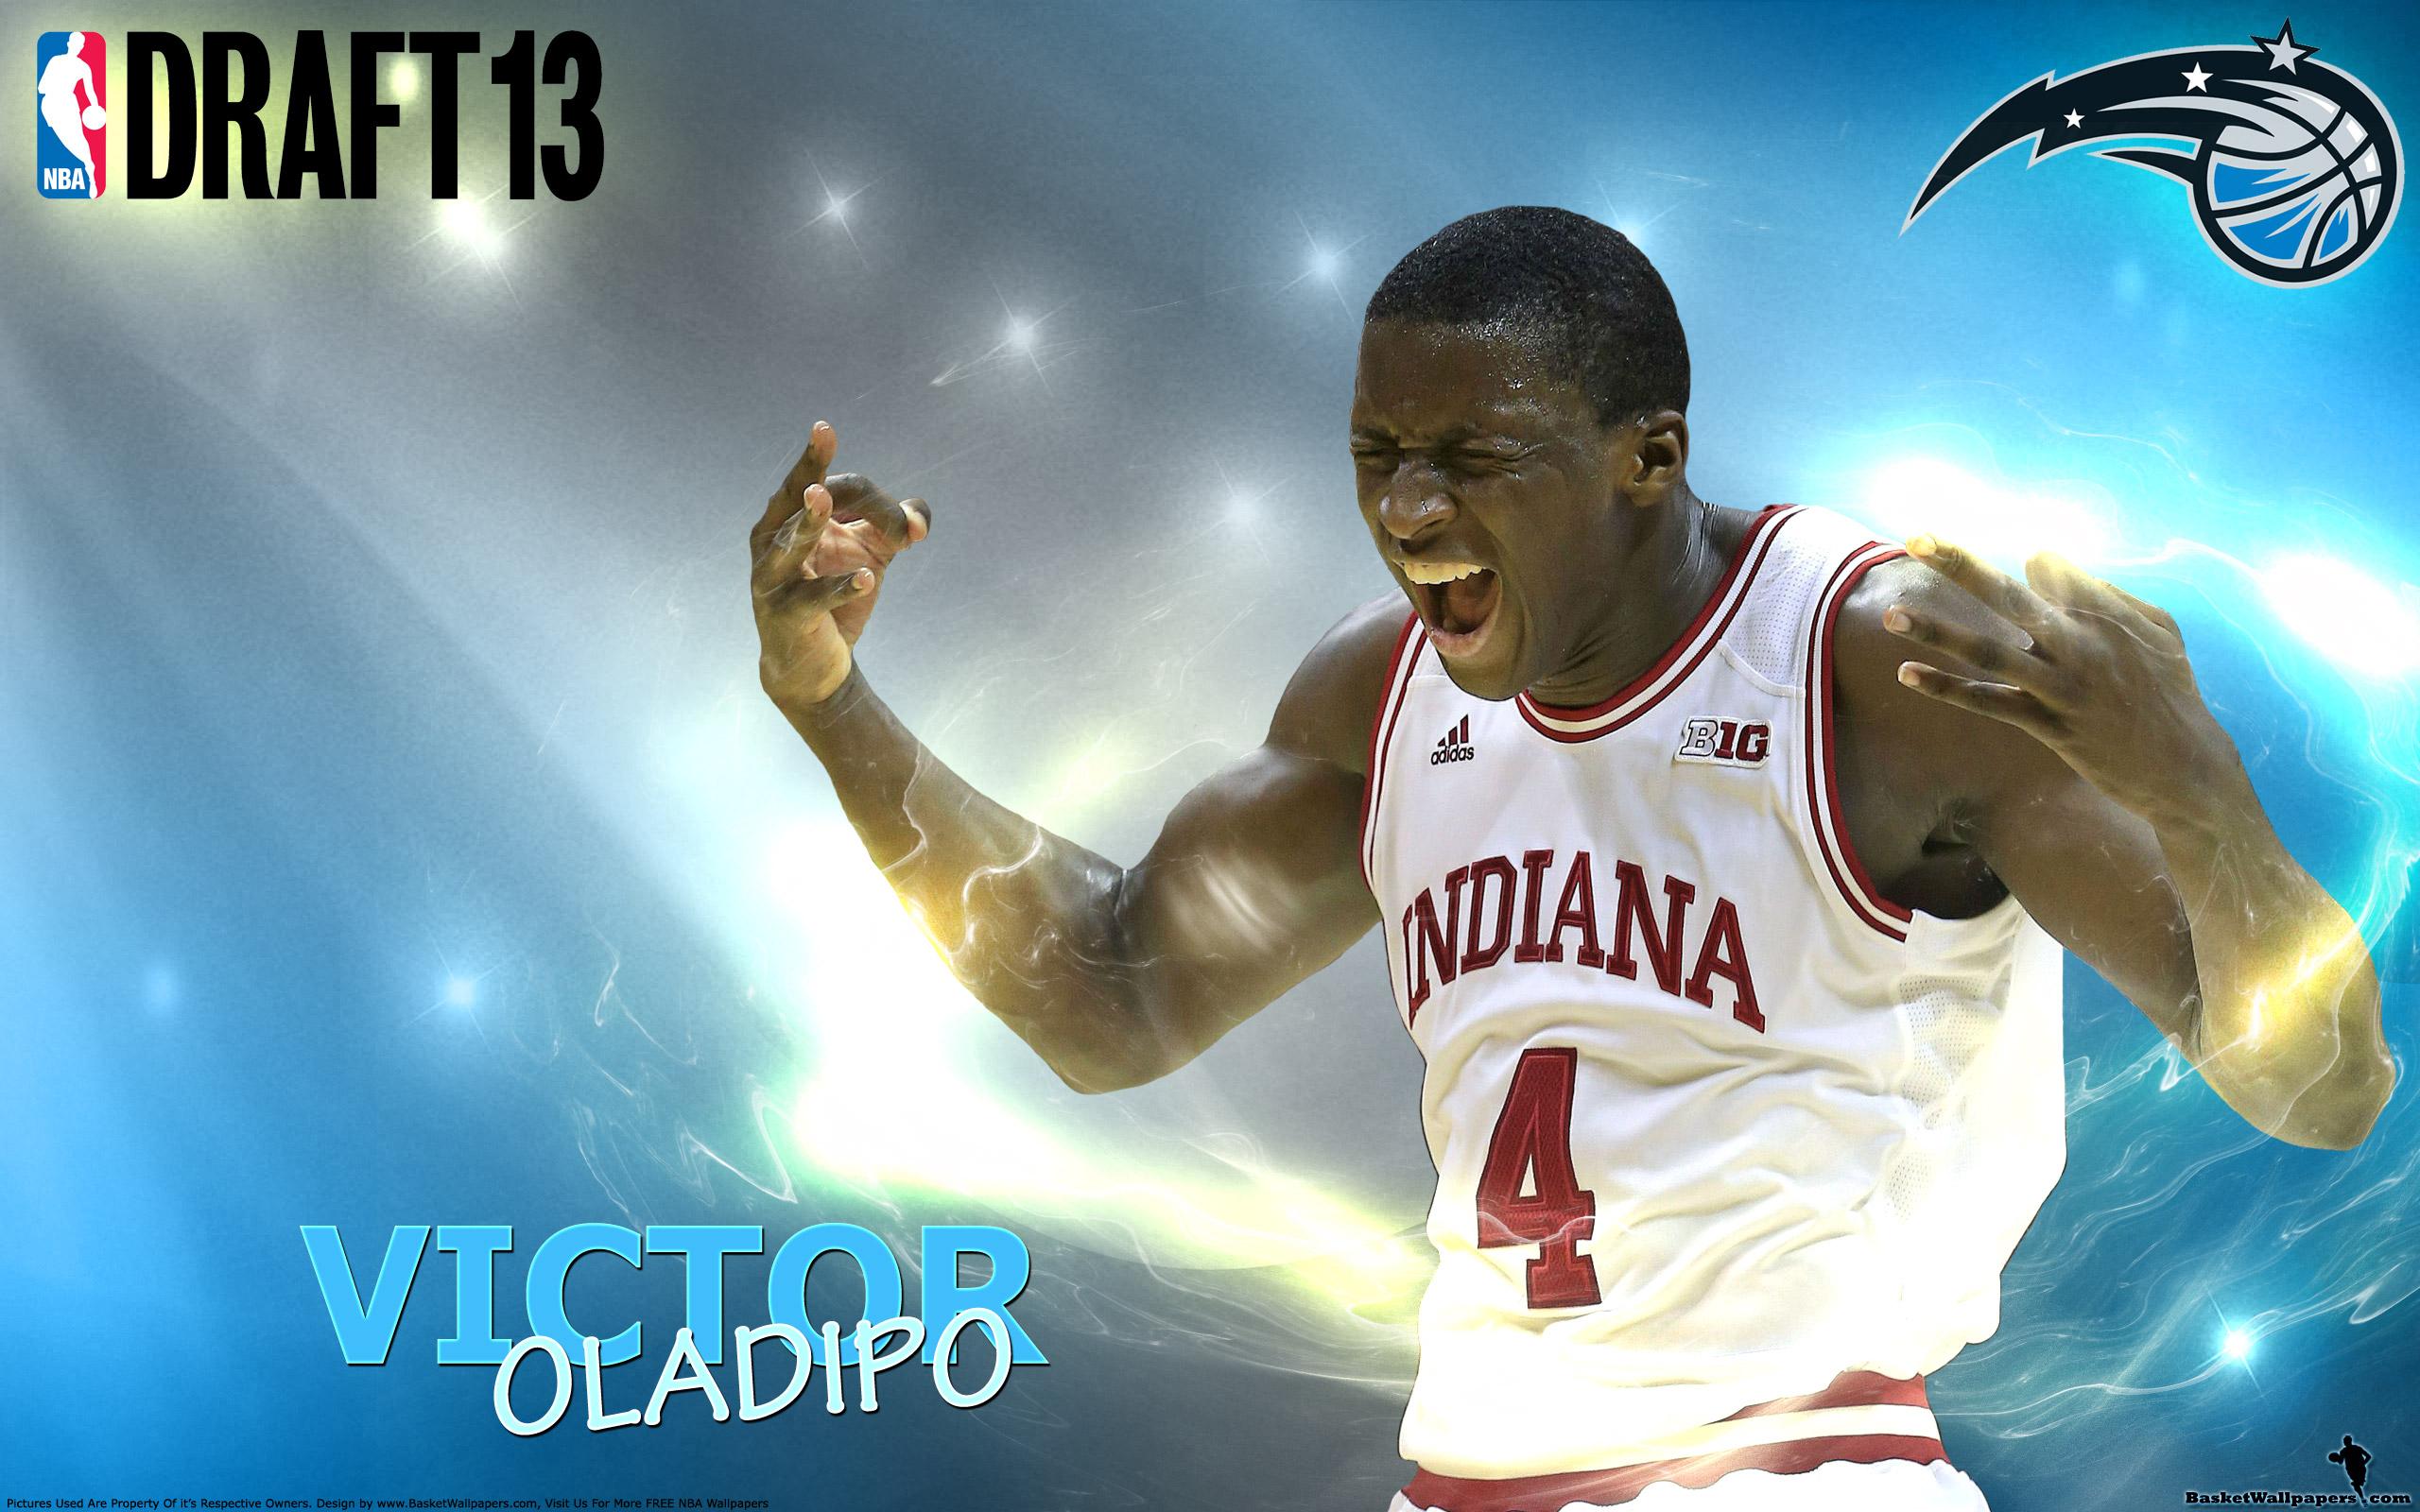 Victor Oladipo 2013 NBA Draft 25601600 Wallpaper 2560x1600